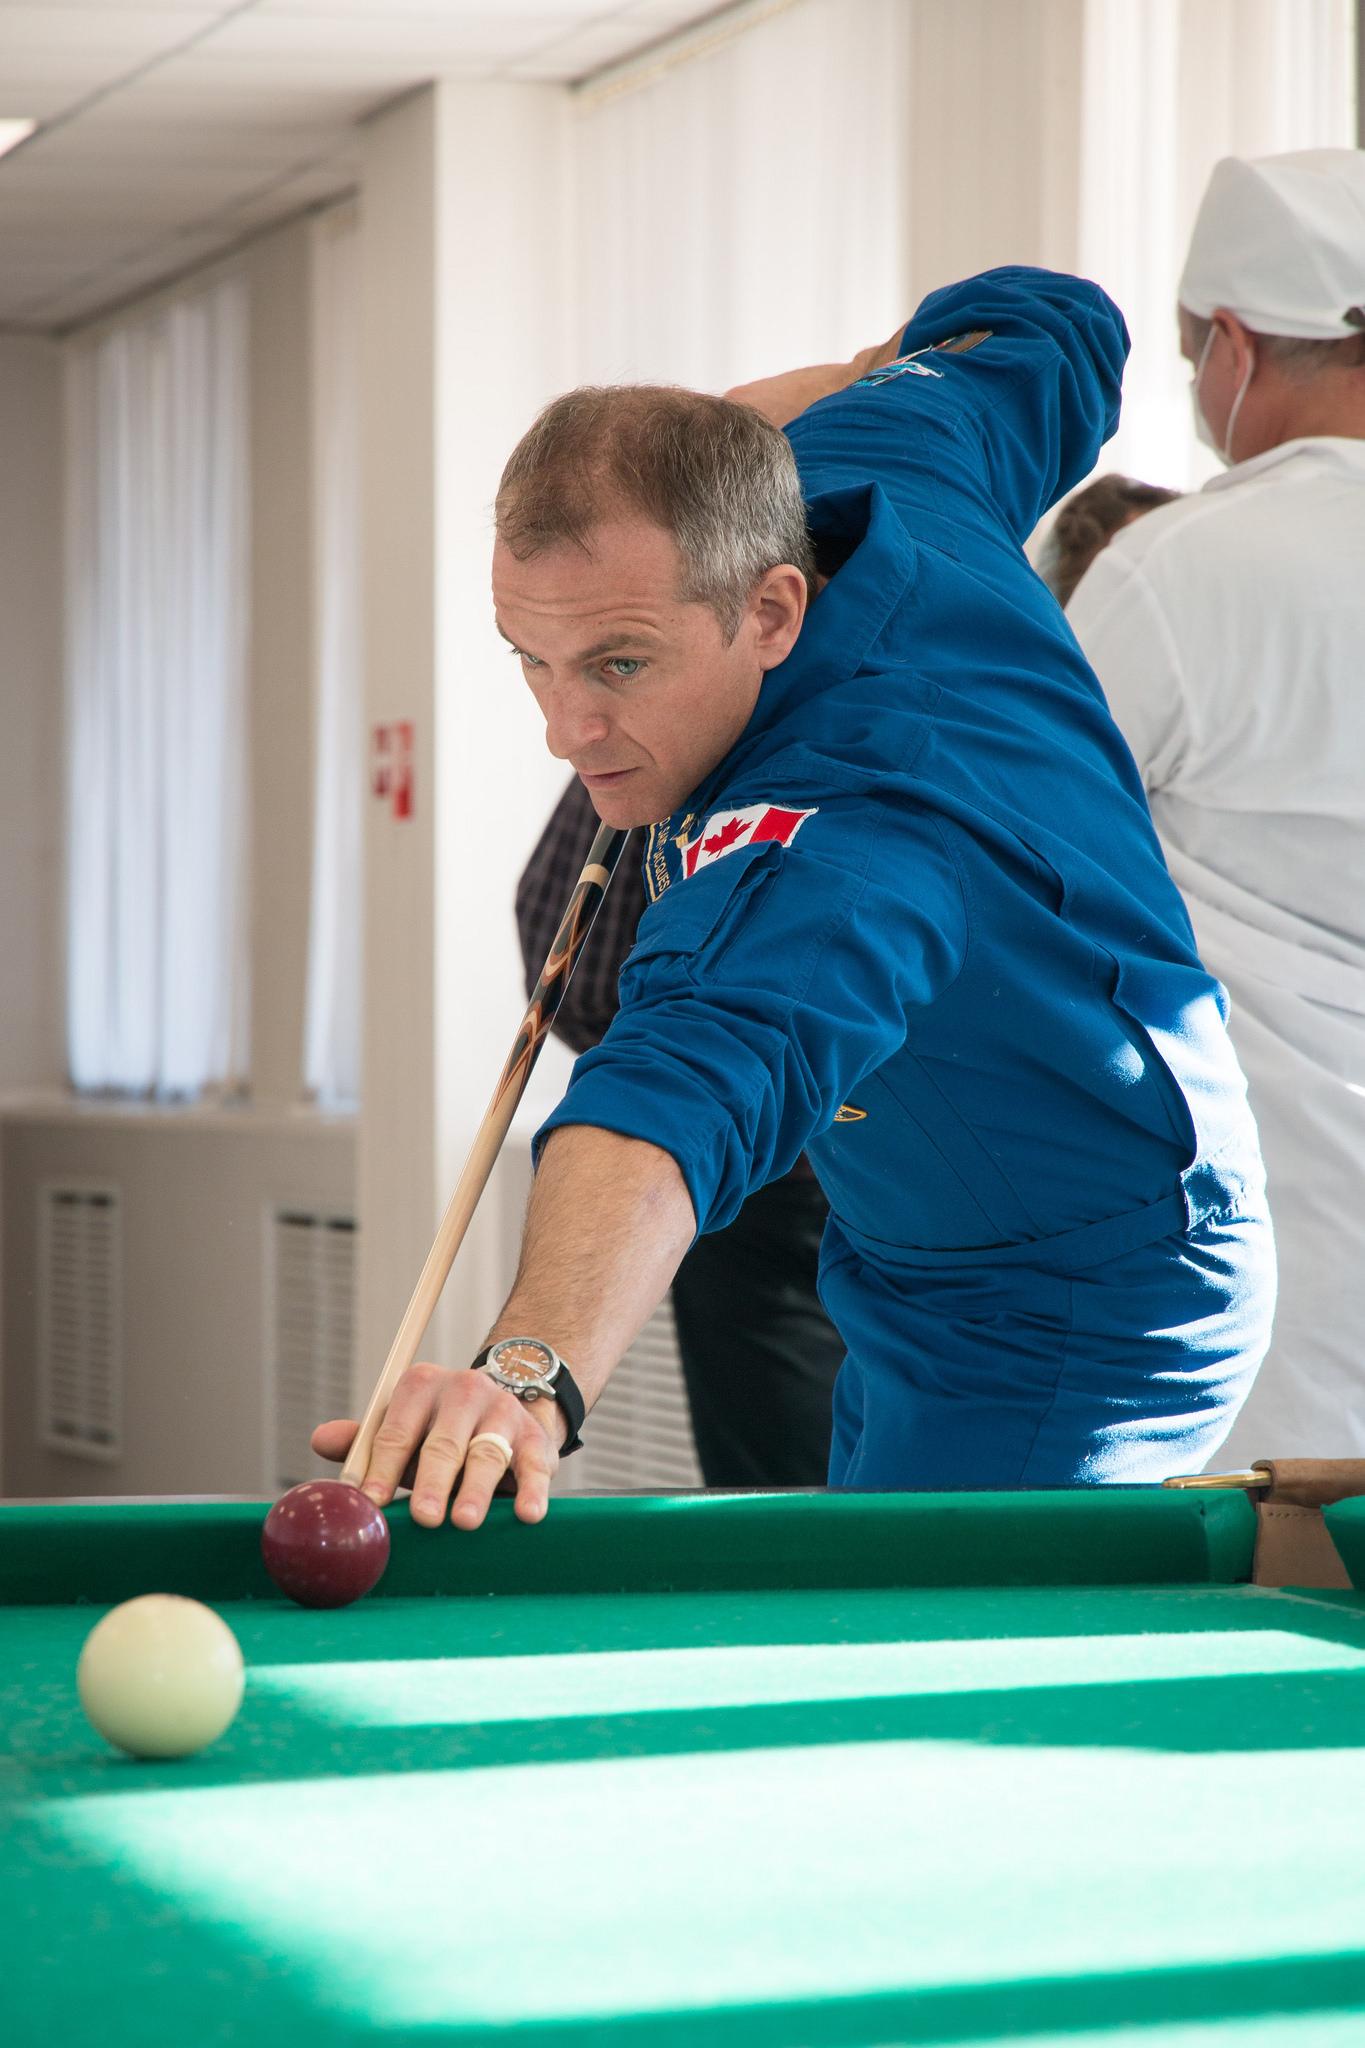 Expedition 58 crew member David Saint-Jacques plays billiards